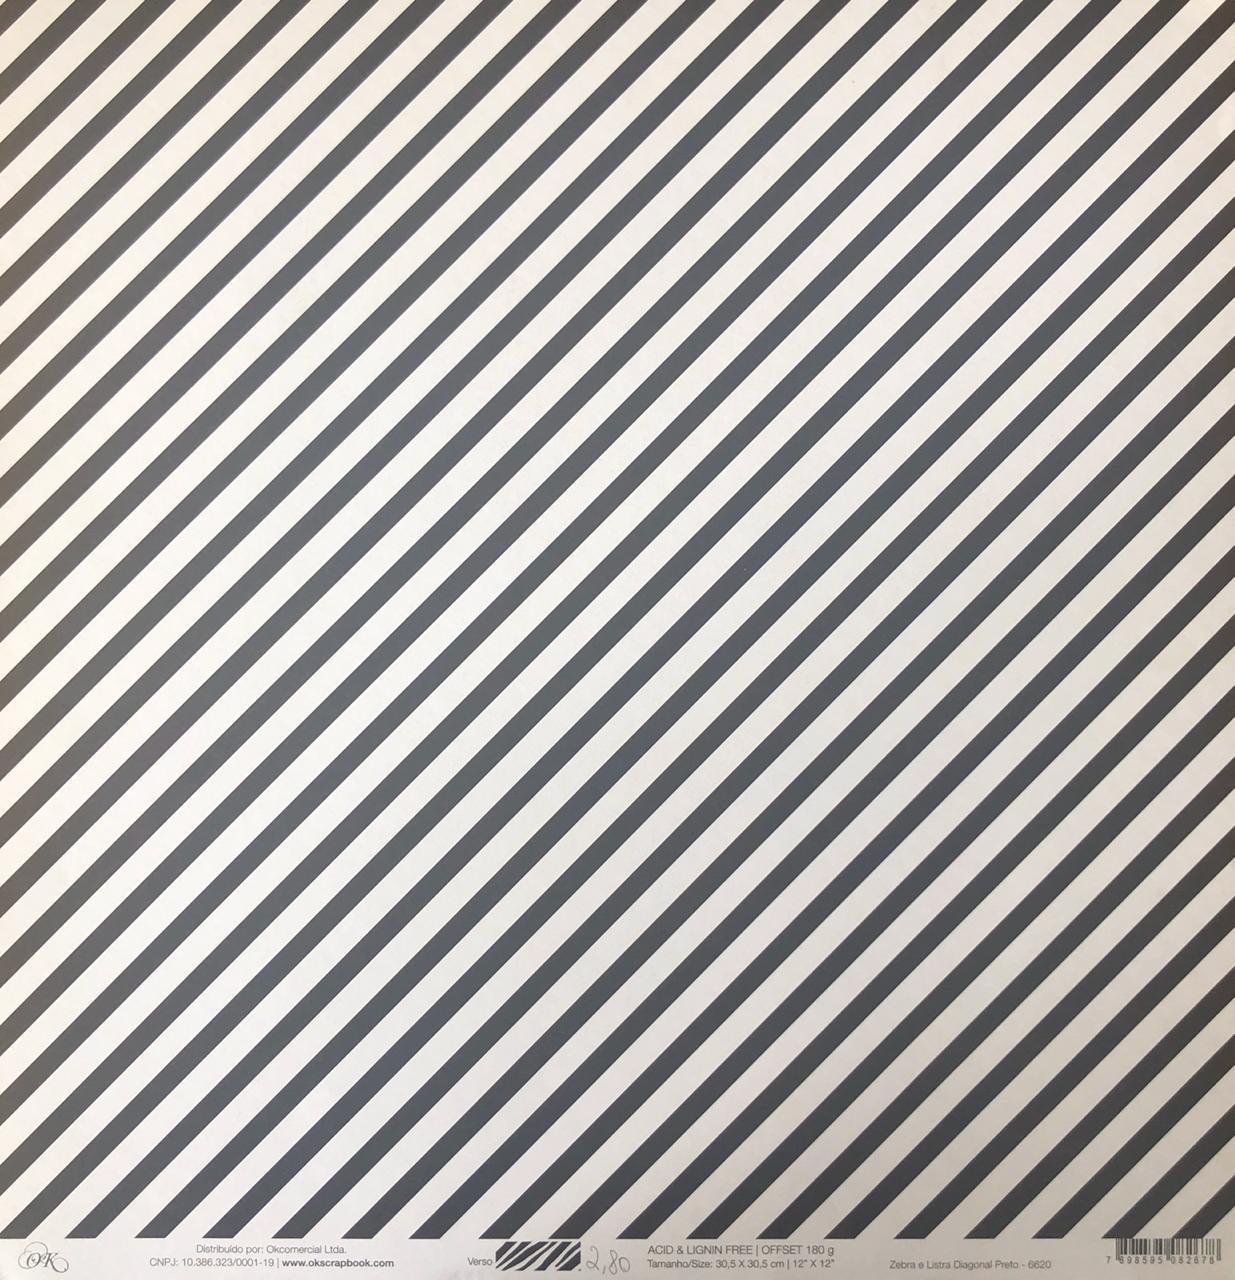 Papel Scrap - Zebra e Listra Diagonal Preto - Ok Scrapbook (6620)